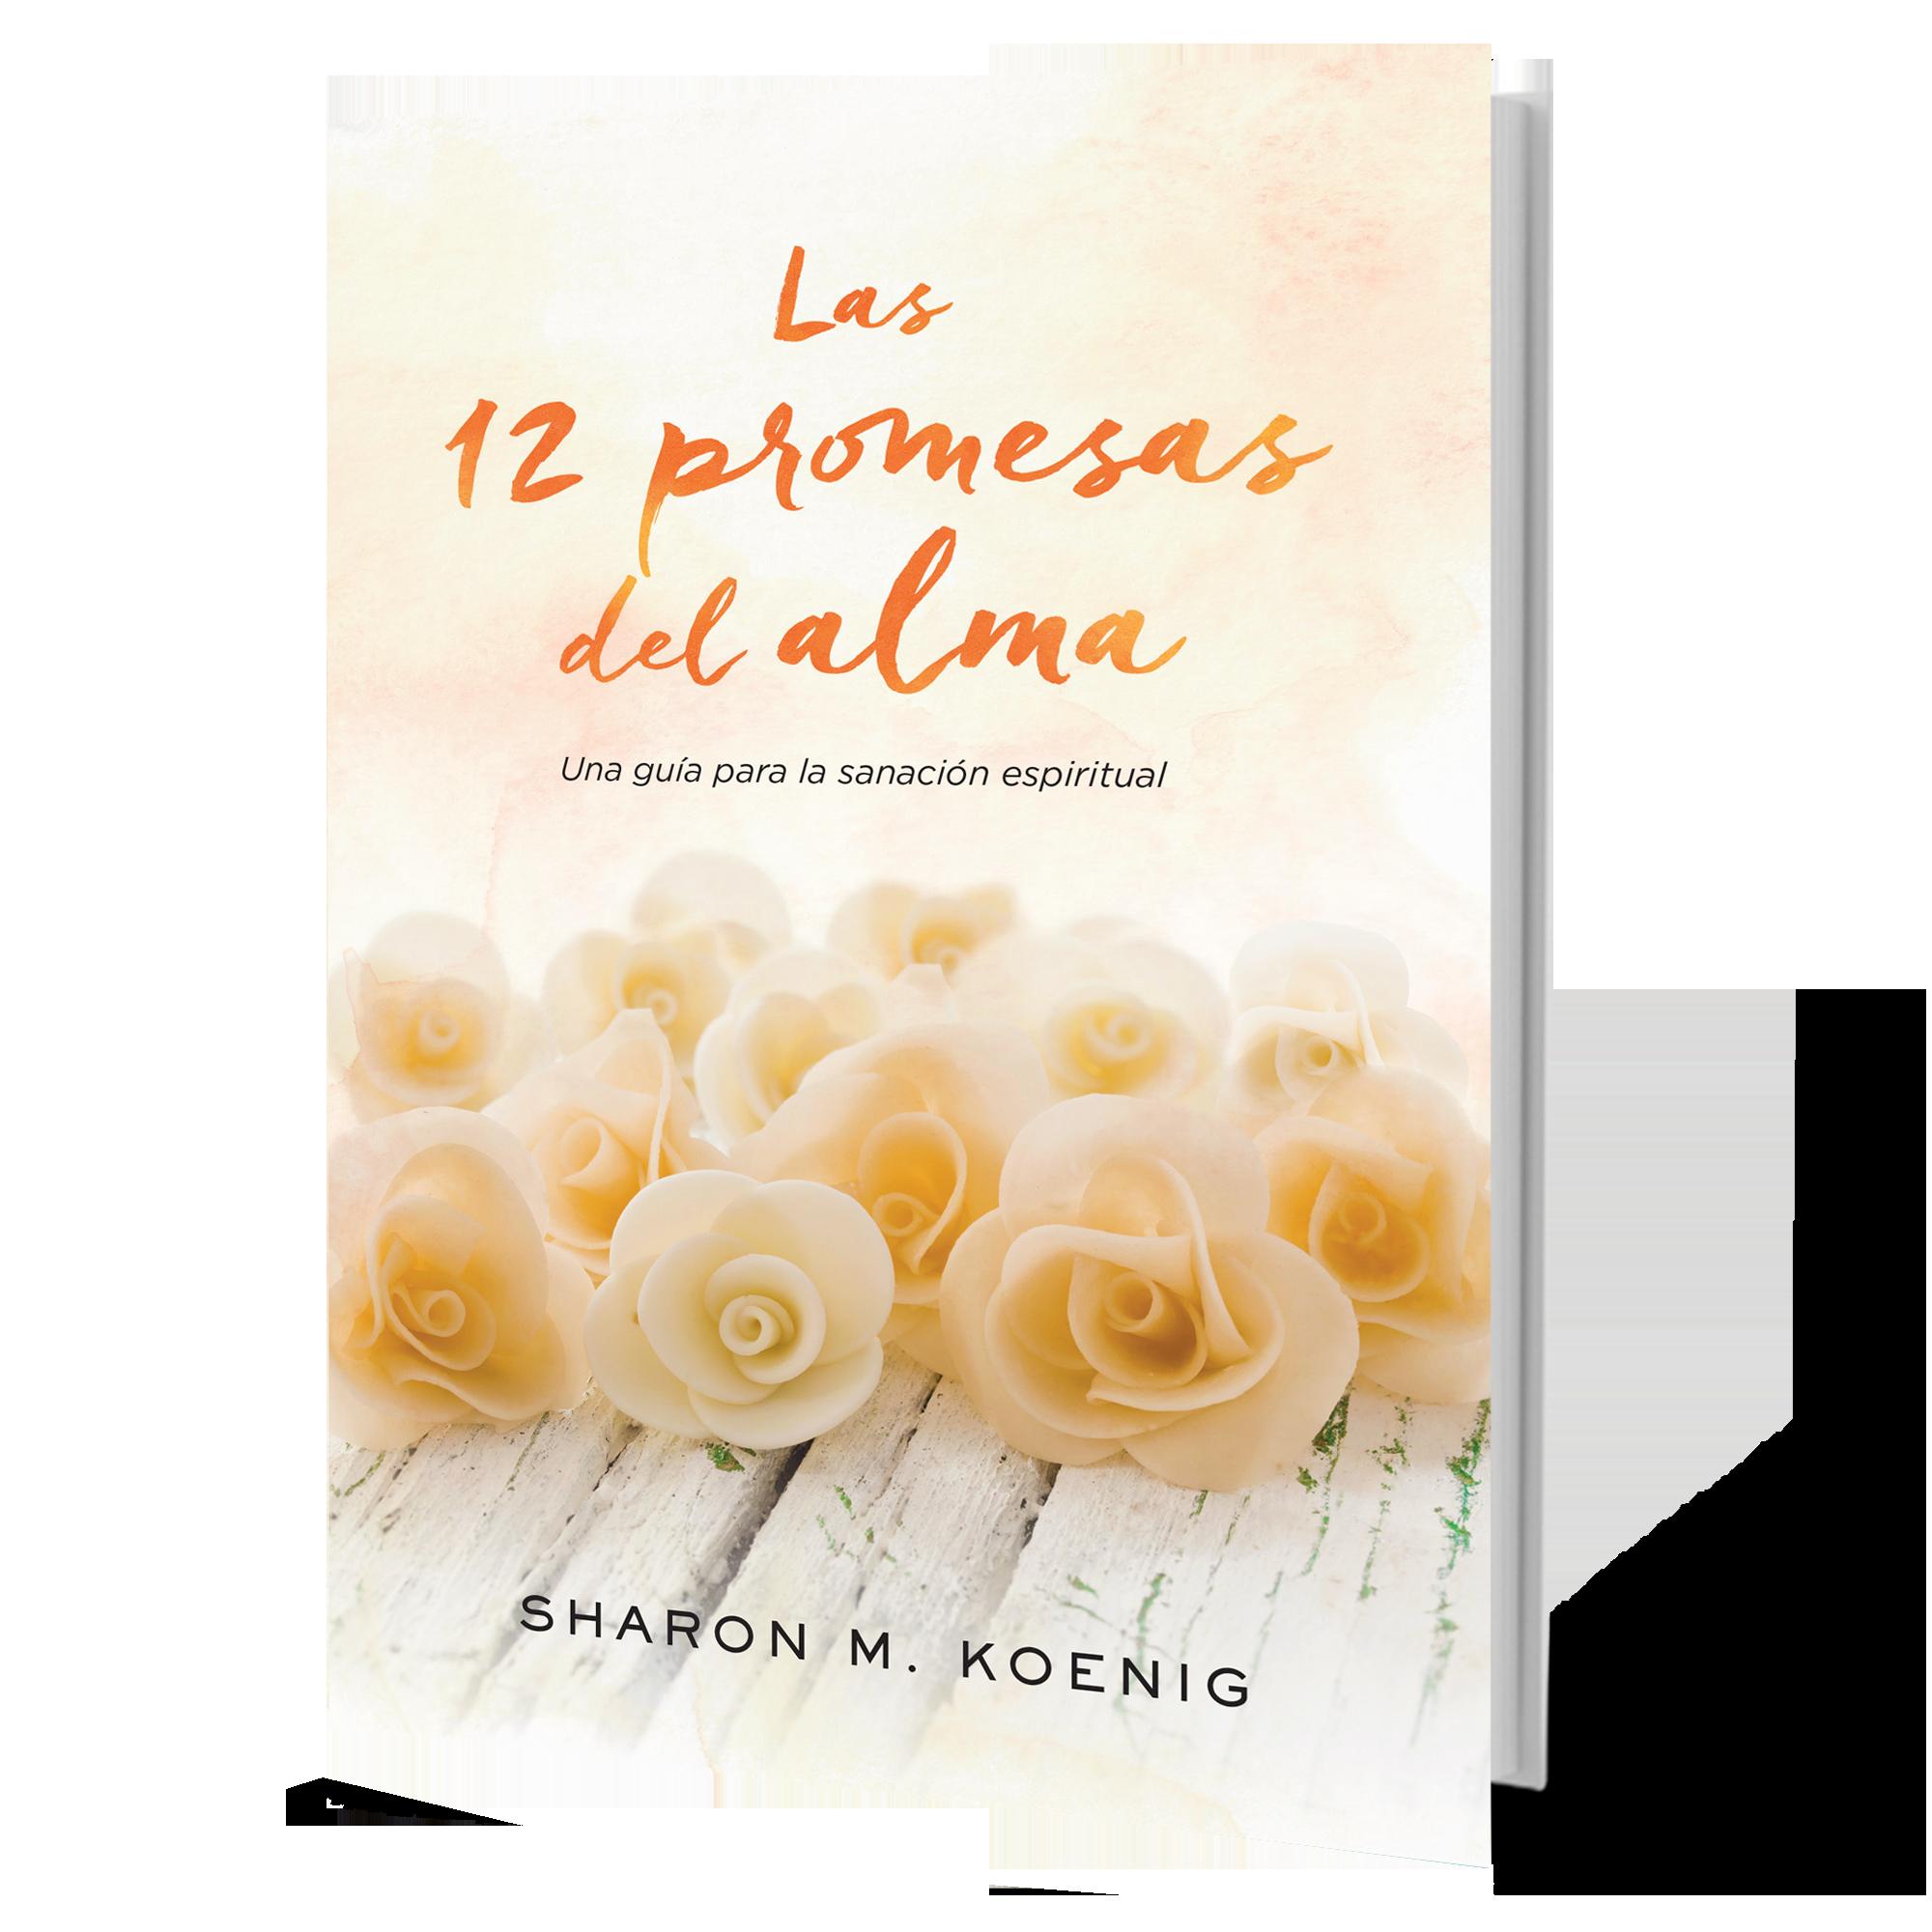 LAS 12 PROMESAS DEL ALMA - KOENIG, SHARON M. - NEW BOOK